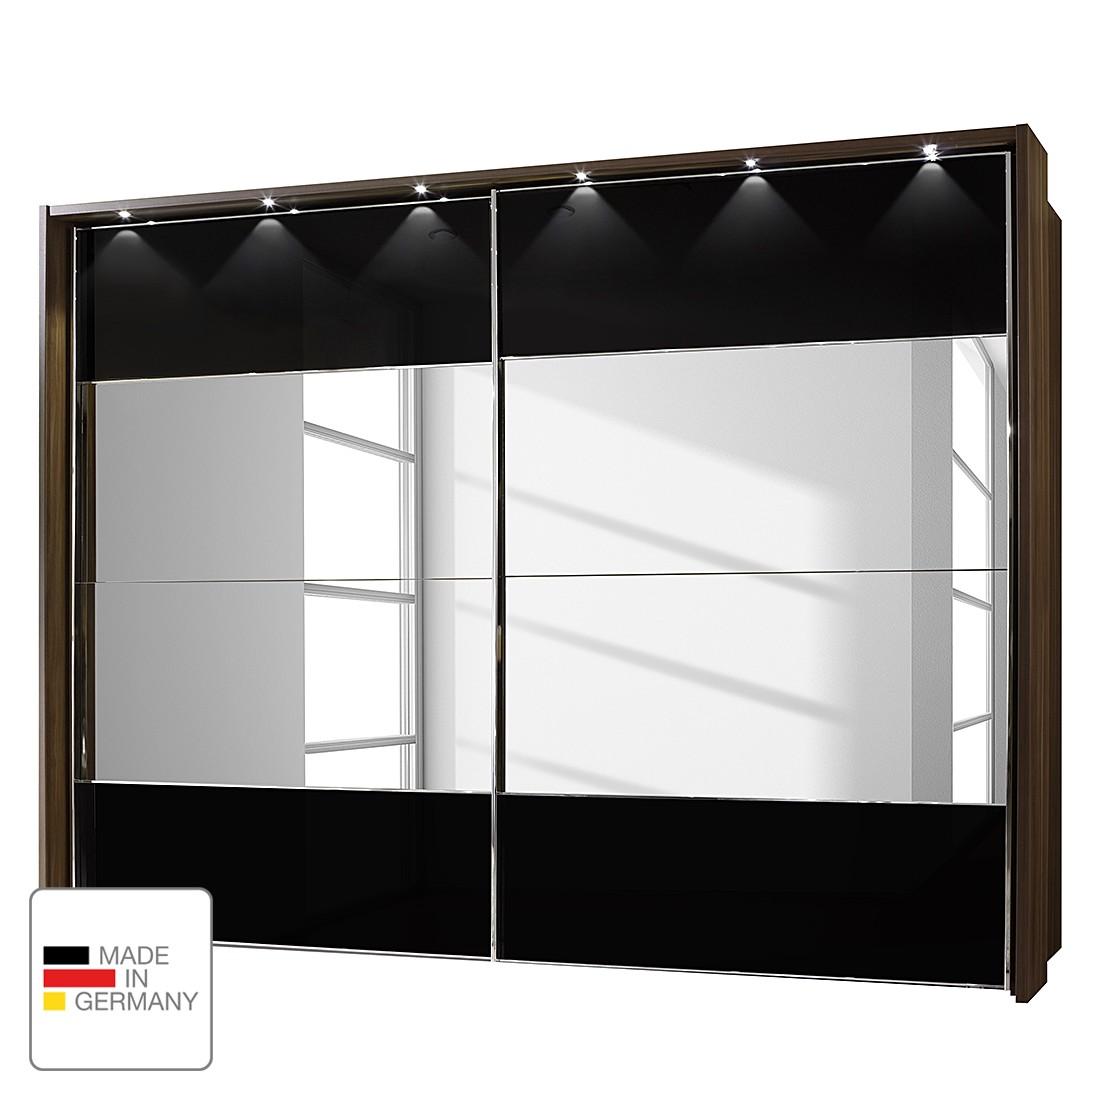 EEK A+, Schwebetürenschrank Monza - Walnuss Dekor/Schwarzglas - LED-Beleuchtung - 200 cm (2-türig) - 216 cm - Mit beleuchtetem Passepartout, Althoff